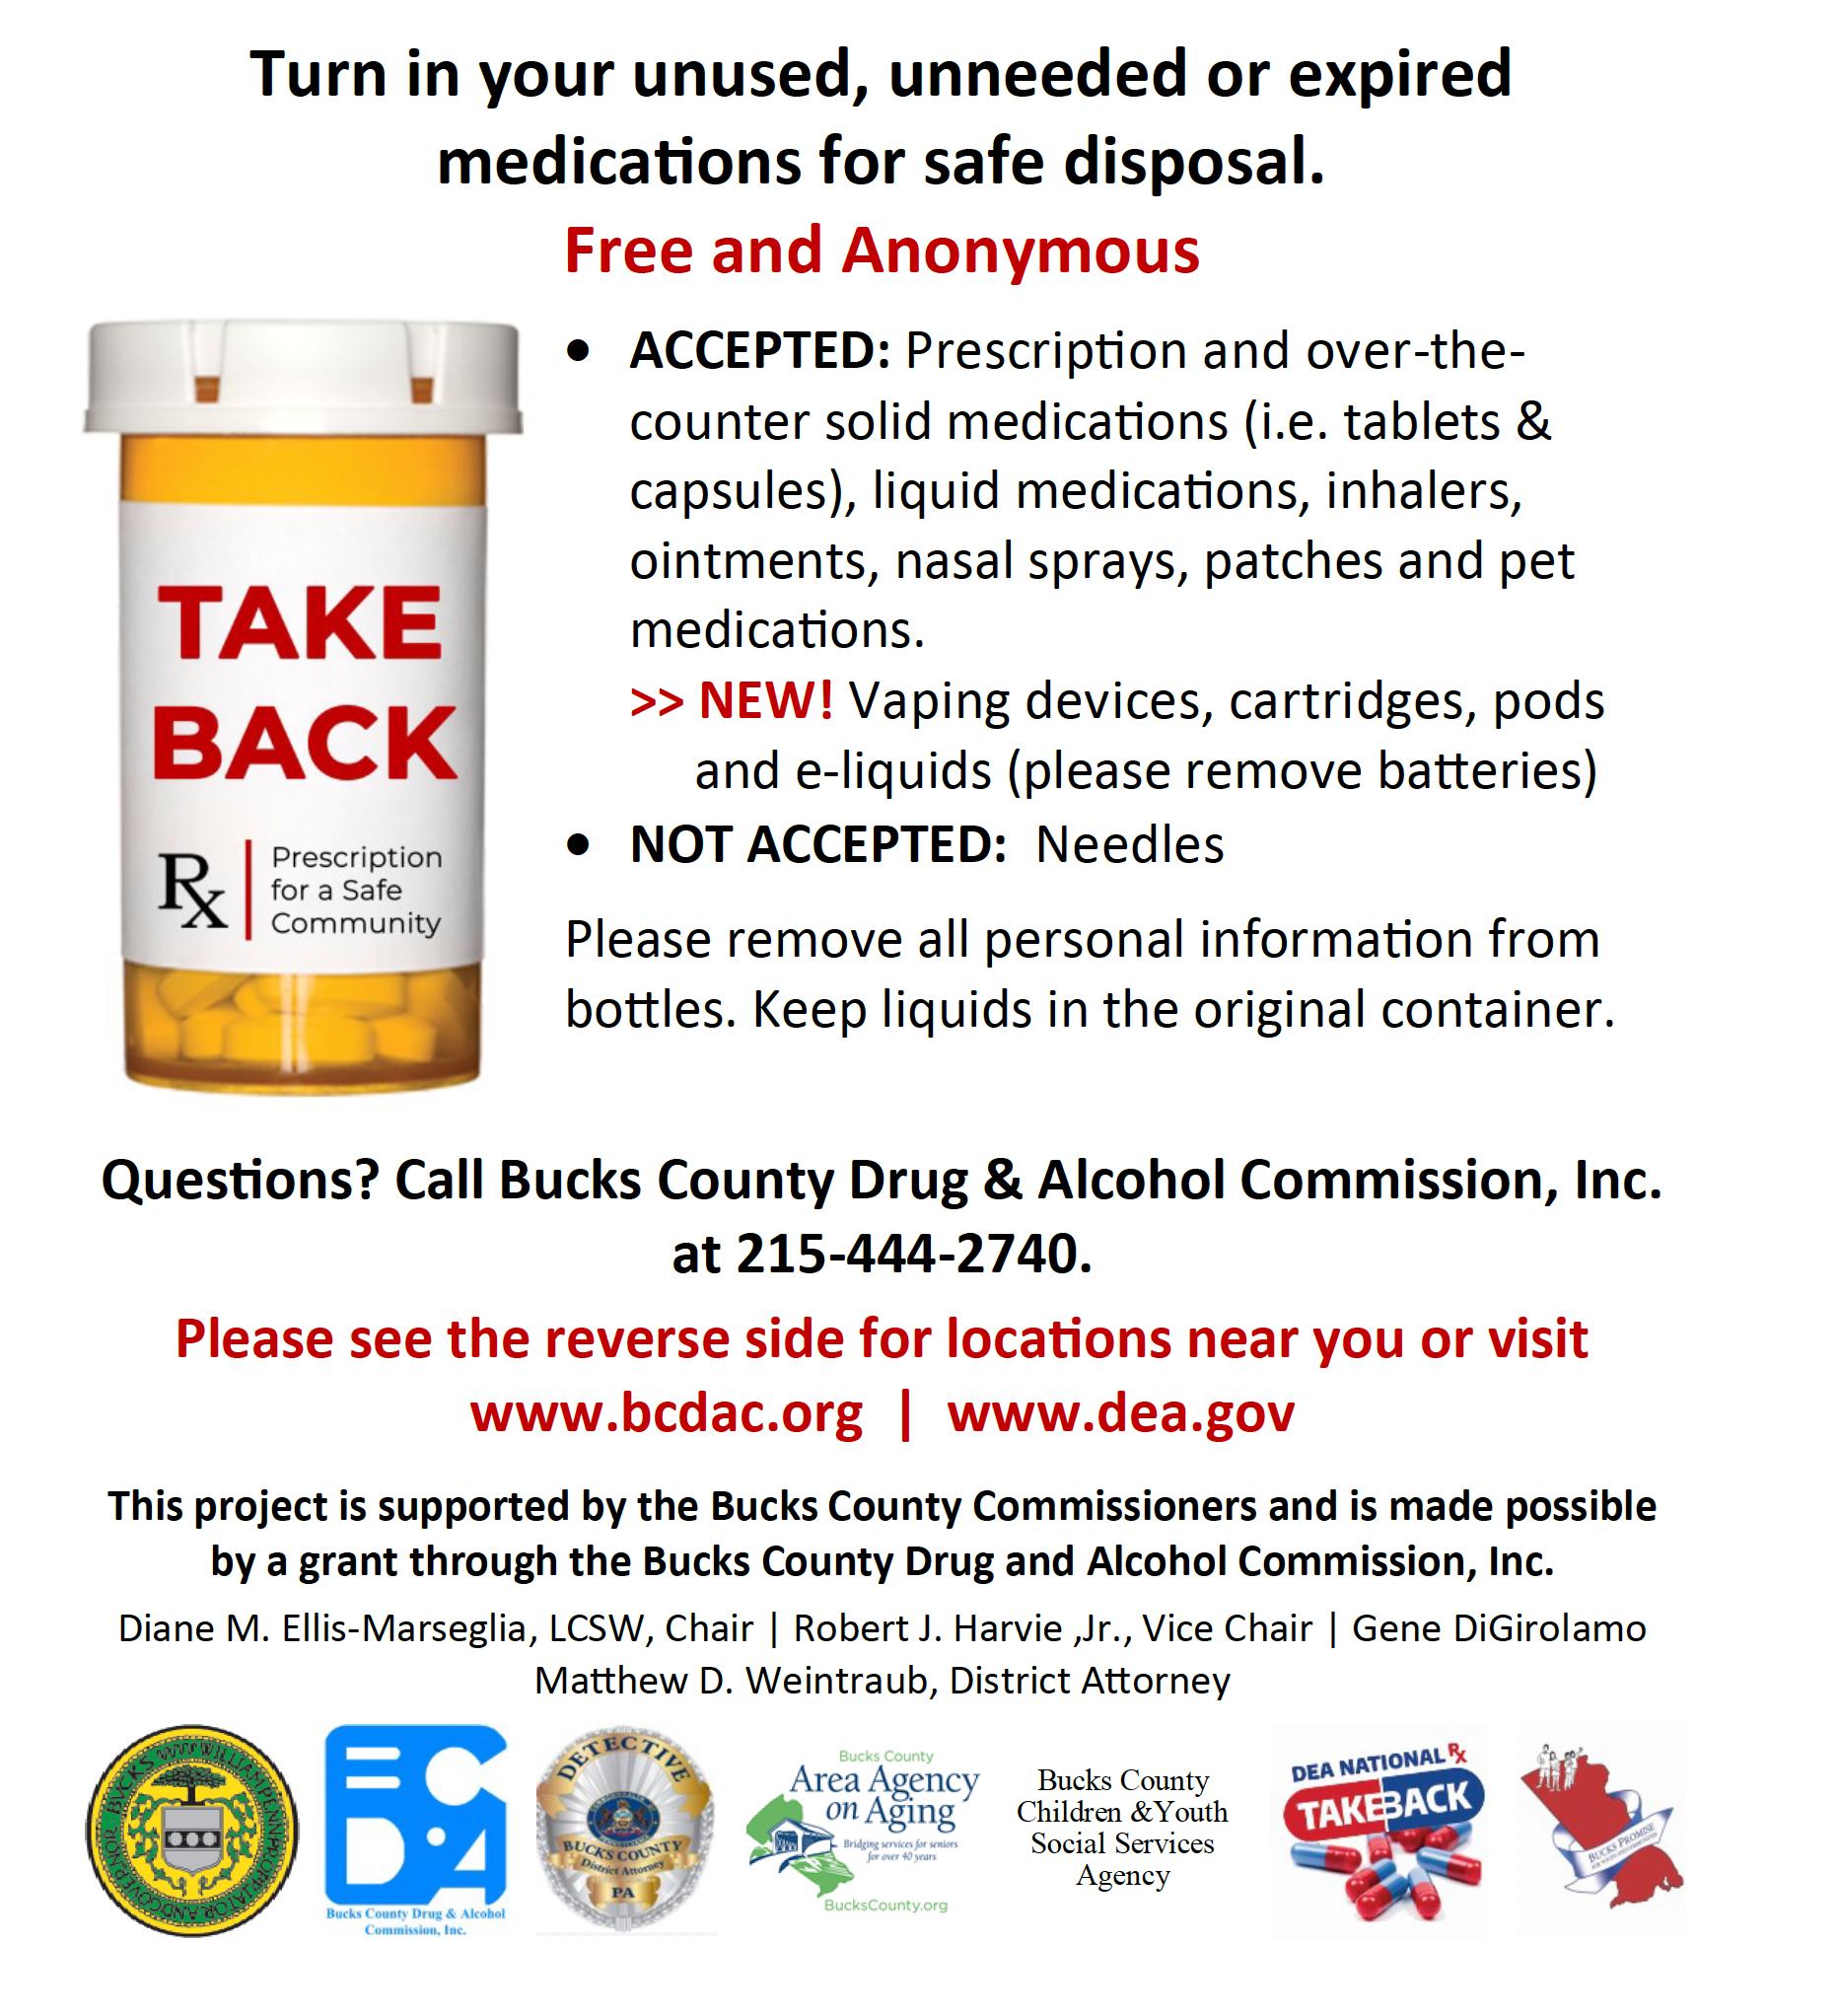 Medication Take Back and Disposal Program